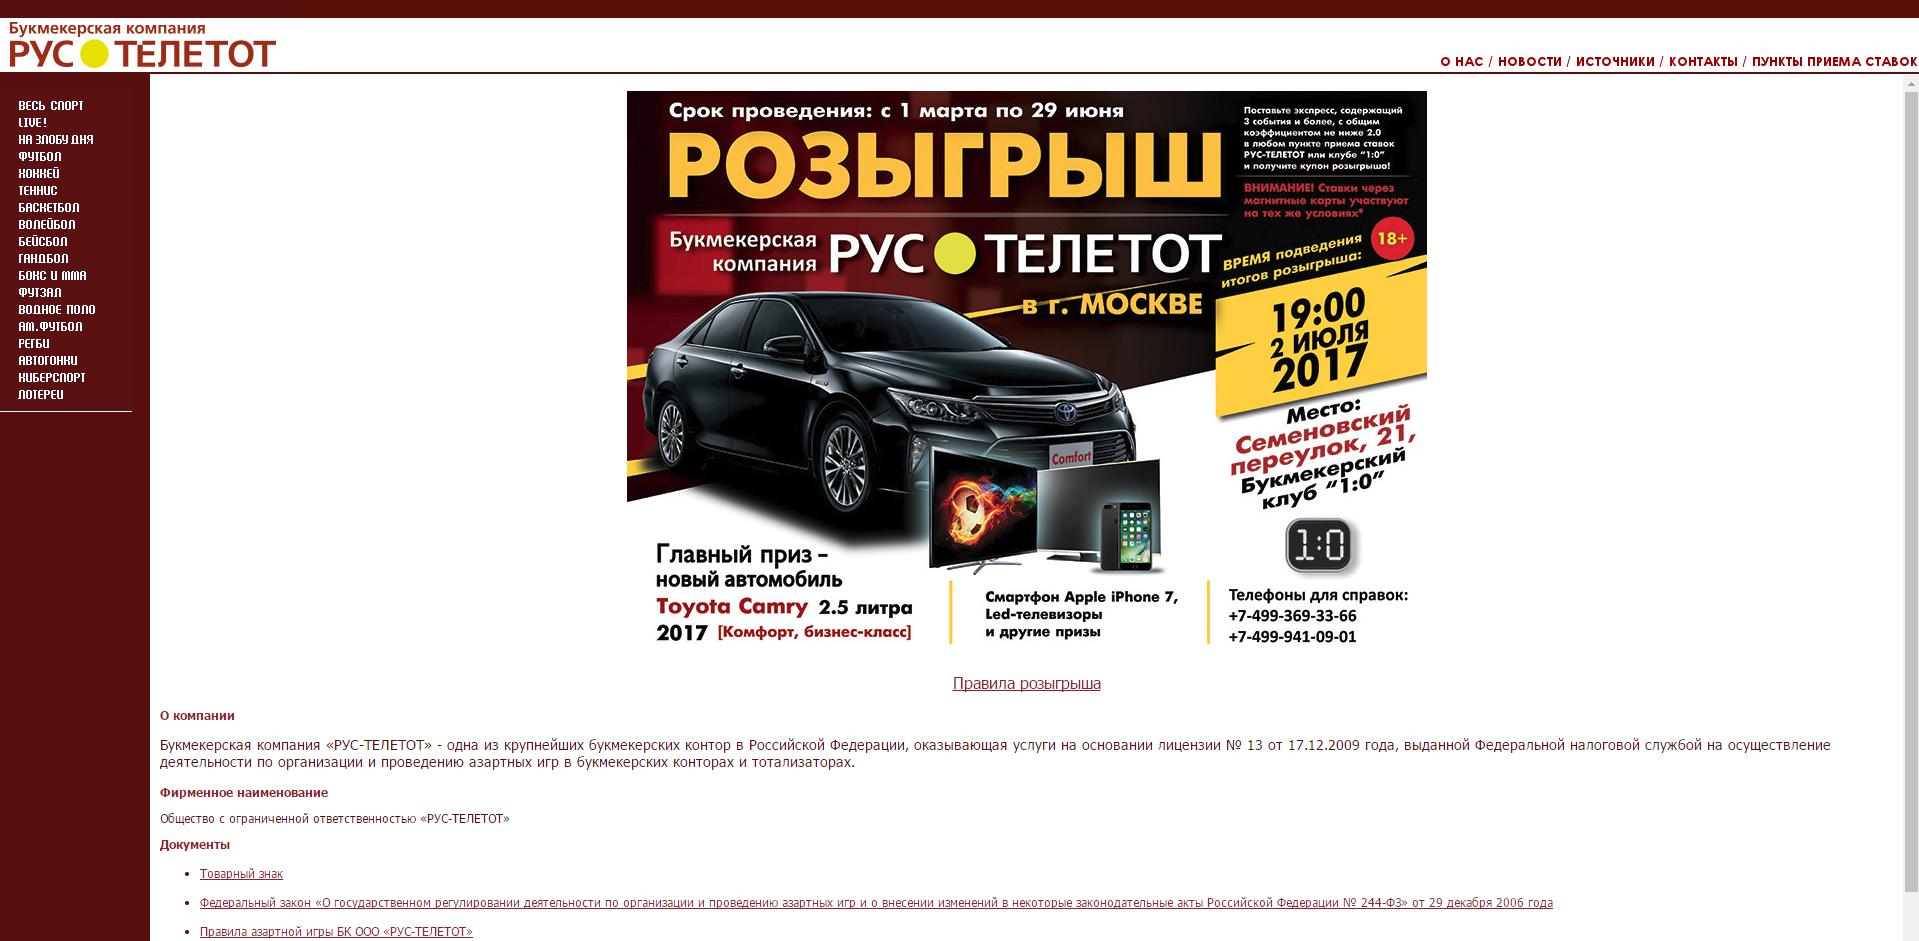 Сайт БК Рус-Телетот